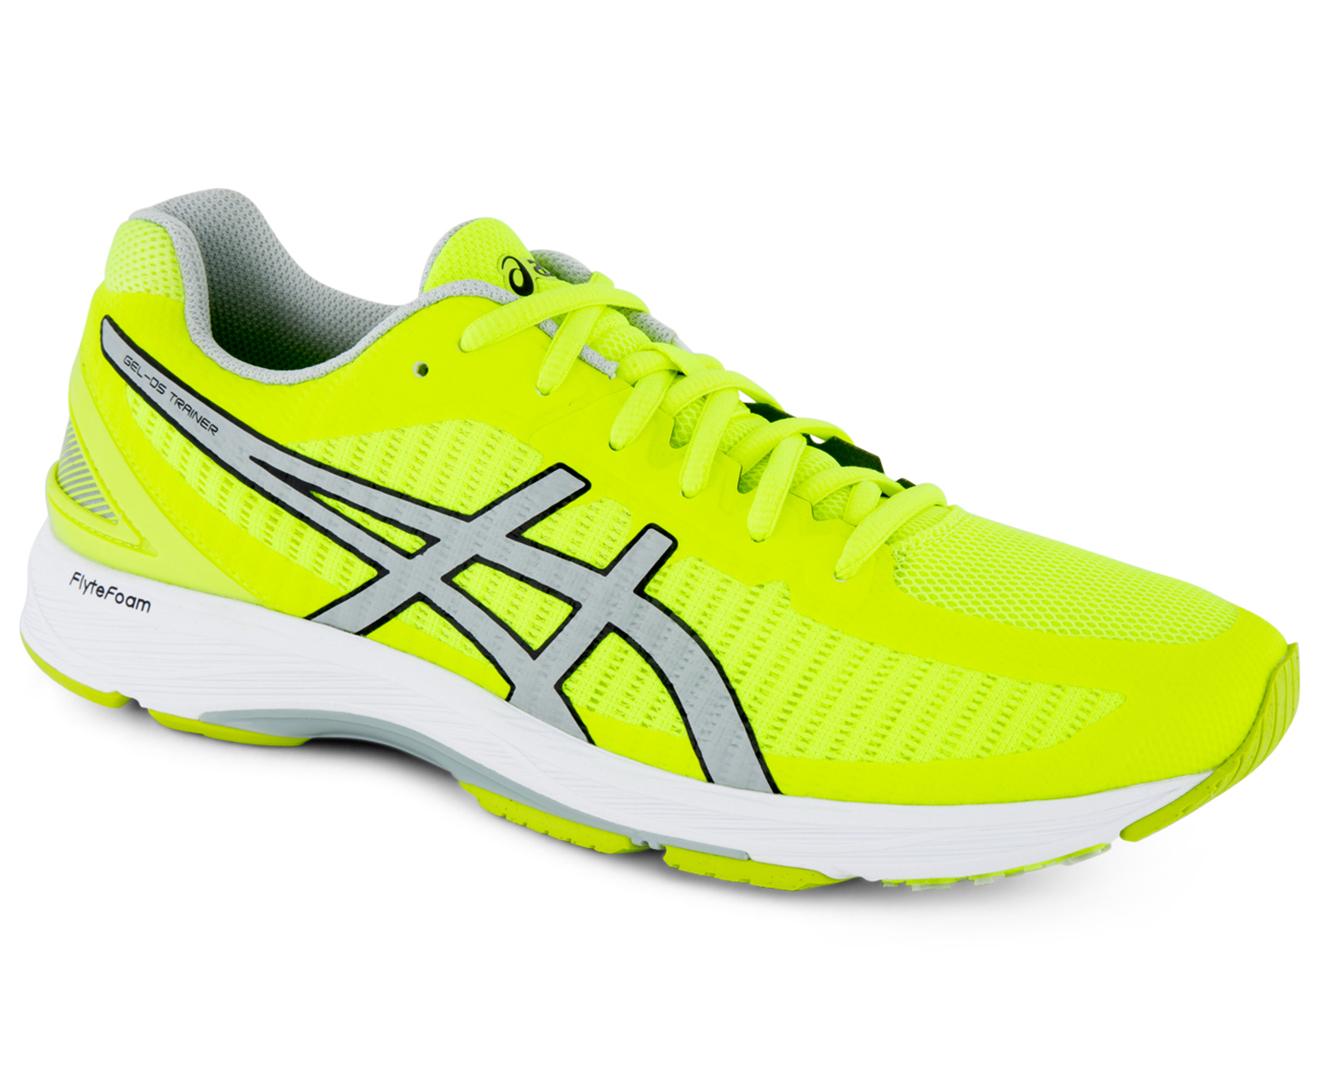 ASICS Men's GEL DS Trainer 23 Shoe Safety YellowMid Grey